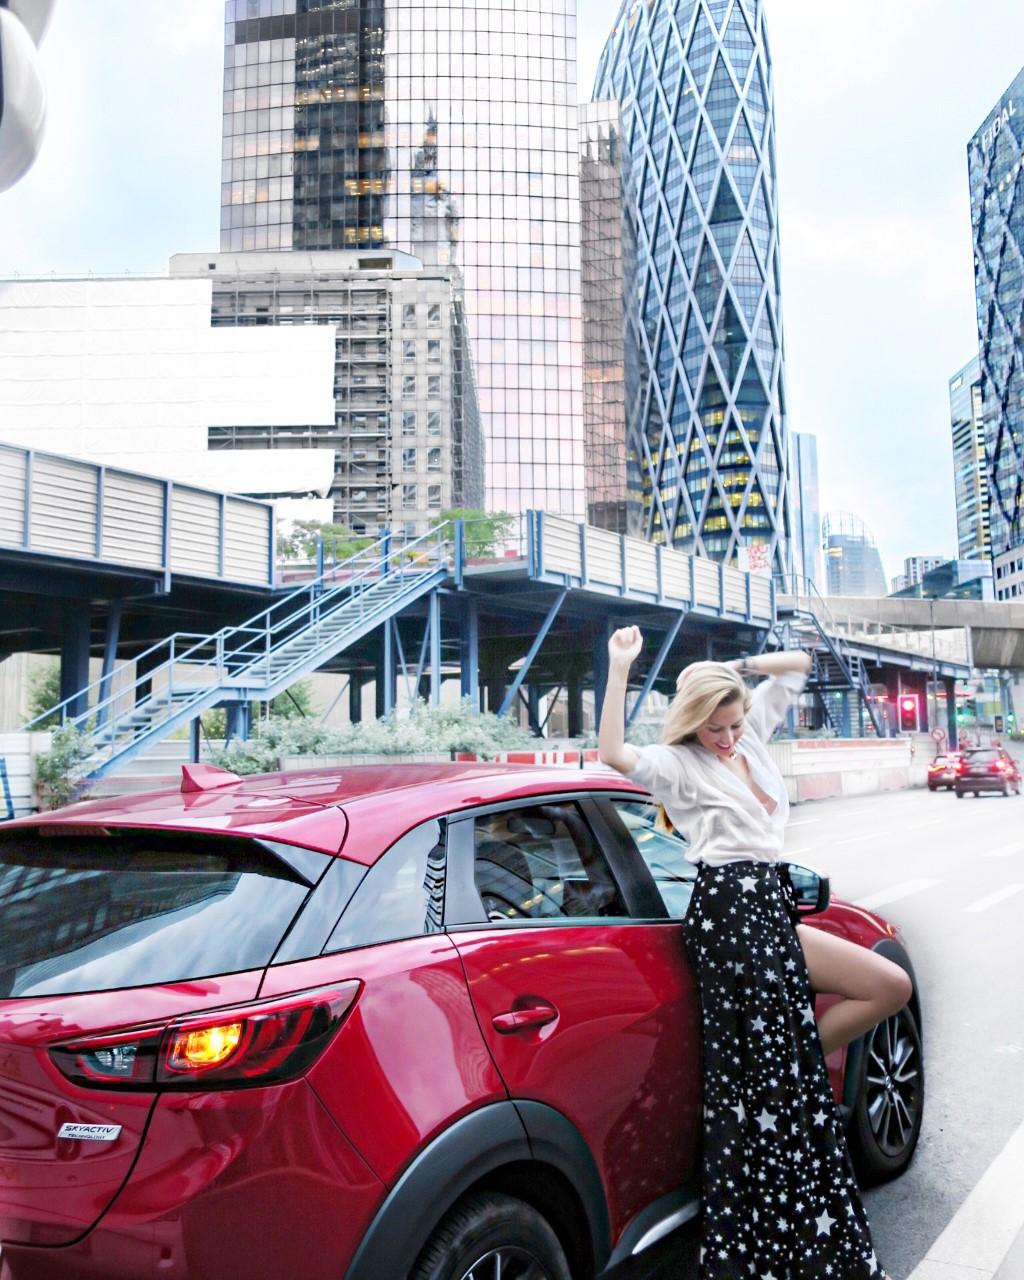 Mazda_CX3_Bymyheels_Tomorrowland_Lara_Martin_Gilarranz (3)